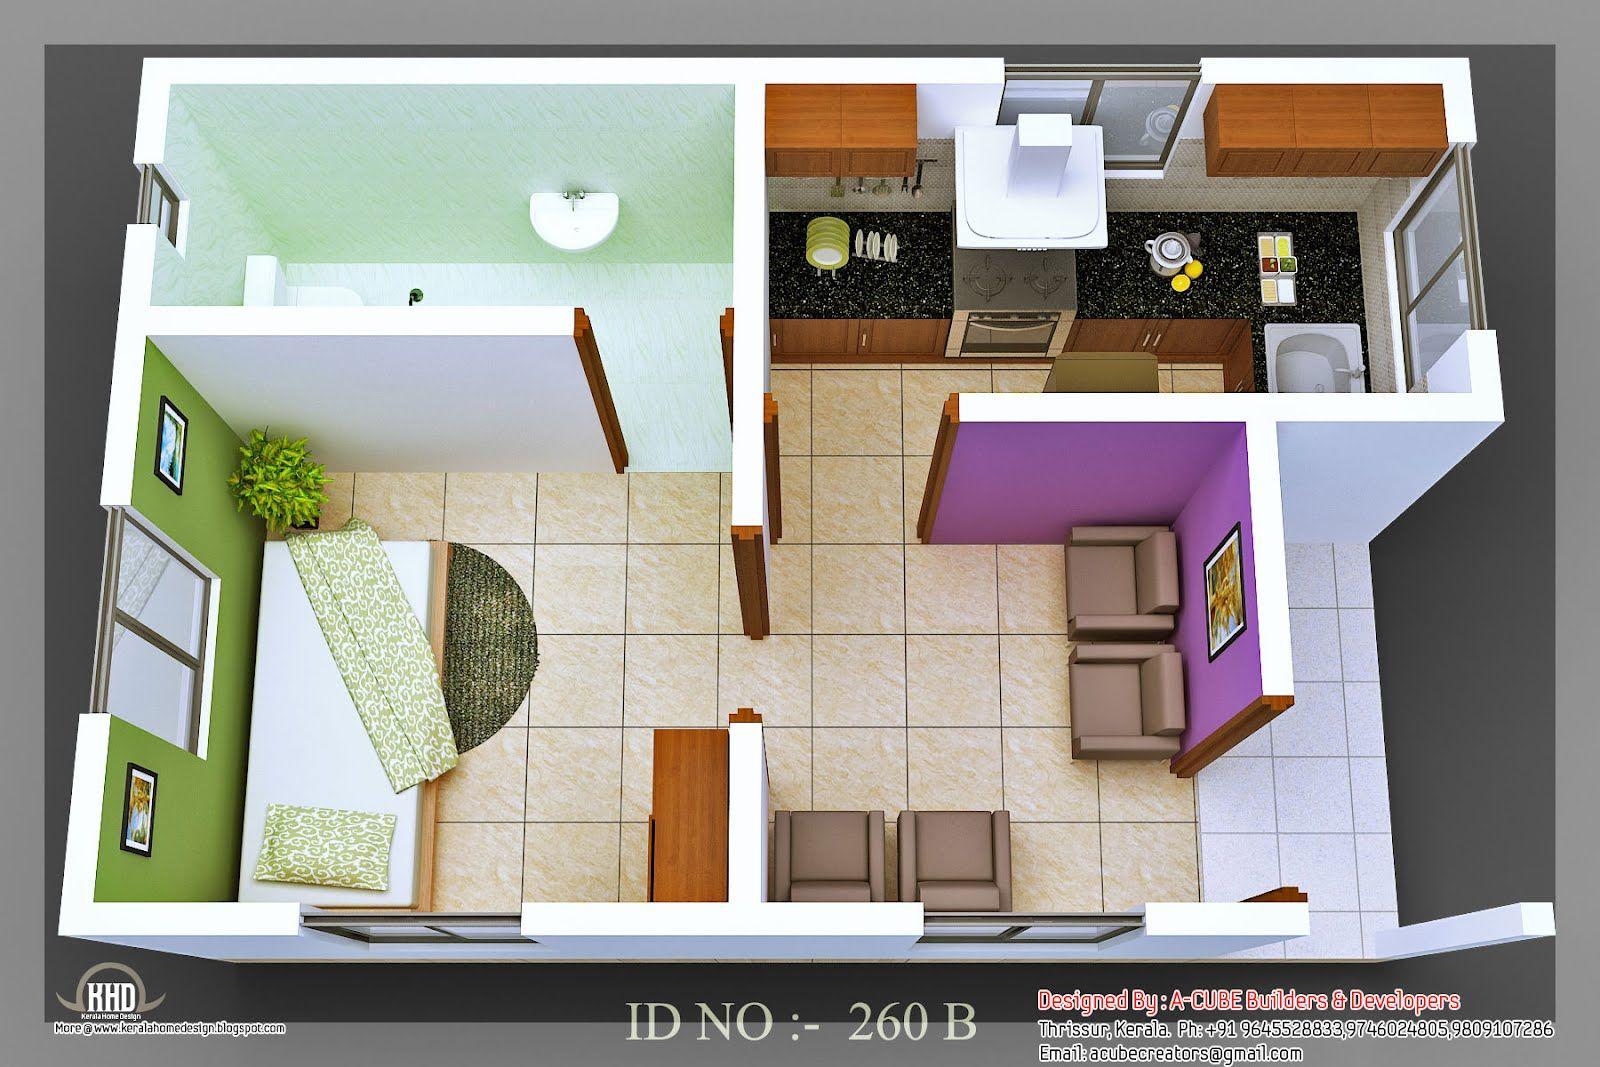 18 Smart Small House Plans Ideas Interior Decorating Colors Small House Design Small House Design Plans Small House Blueprints